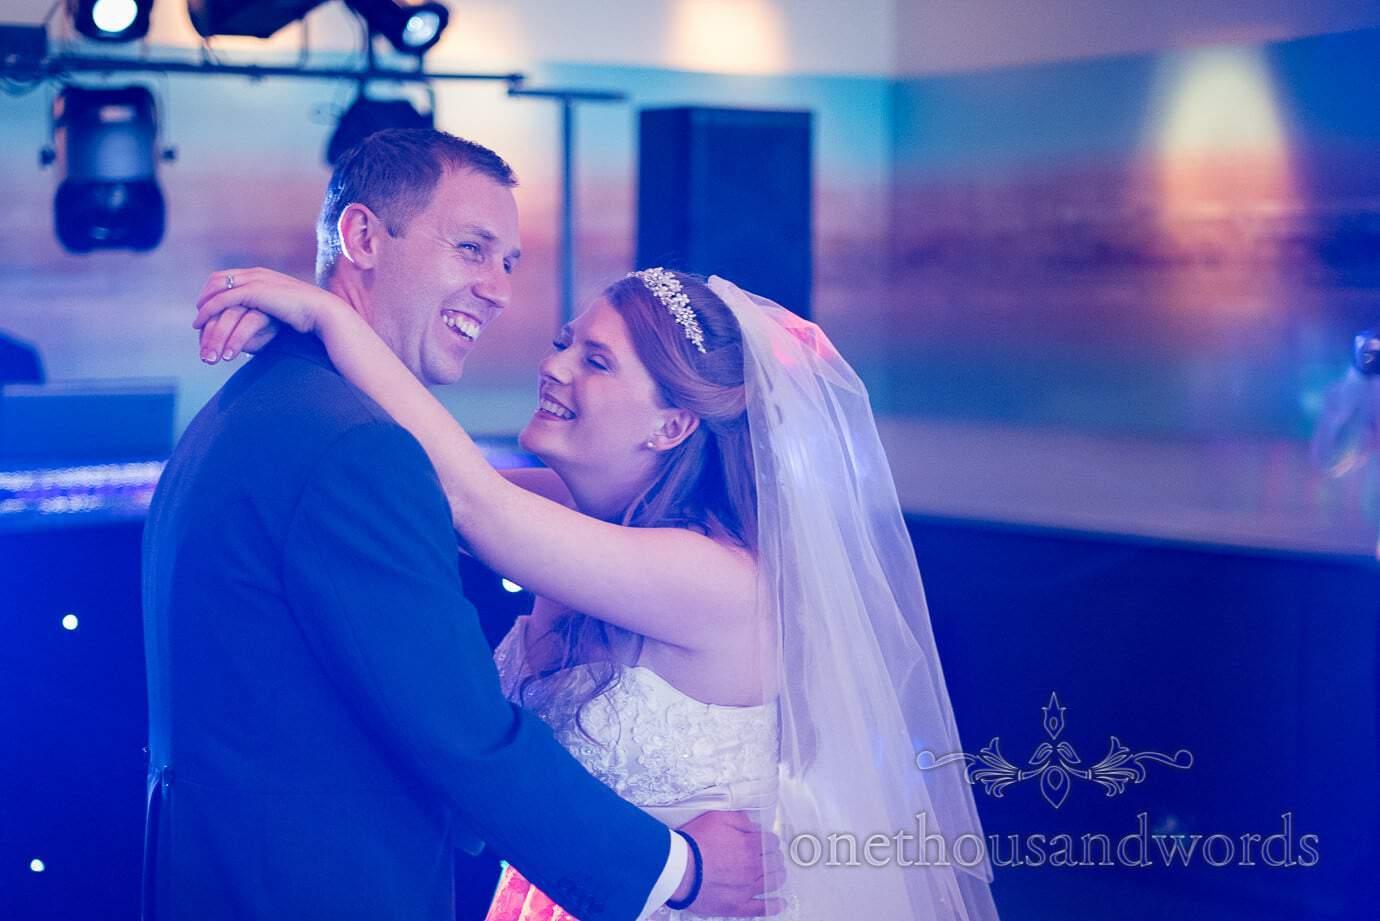 First dance under blue disco lights at Harbour Heights wedding photos